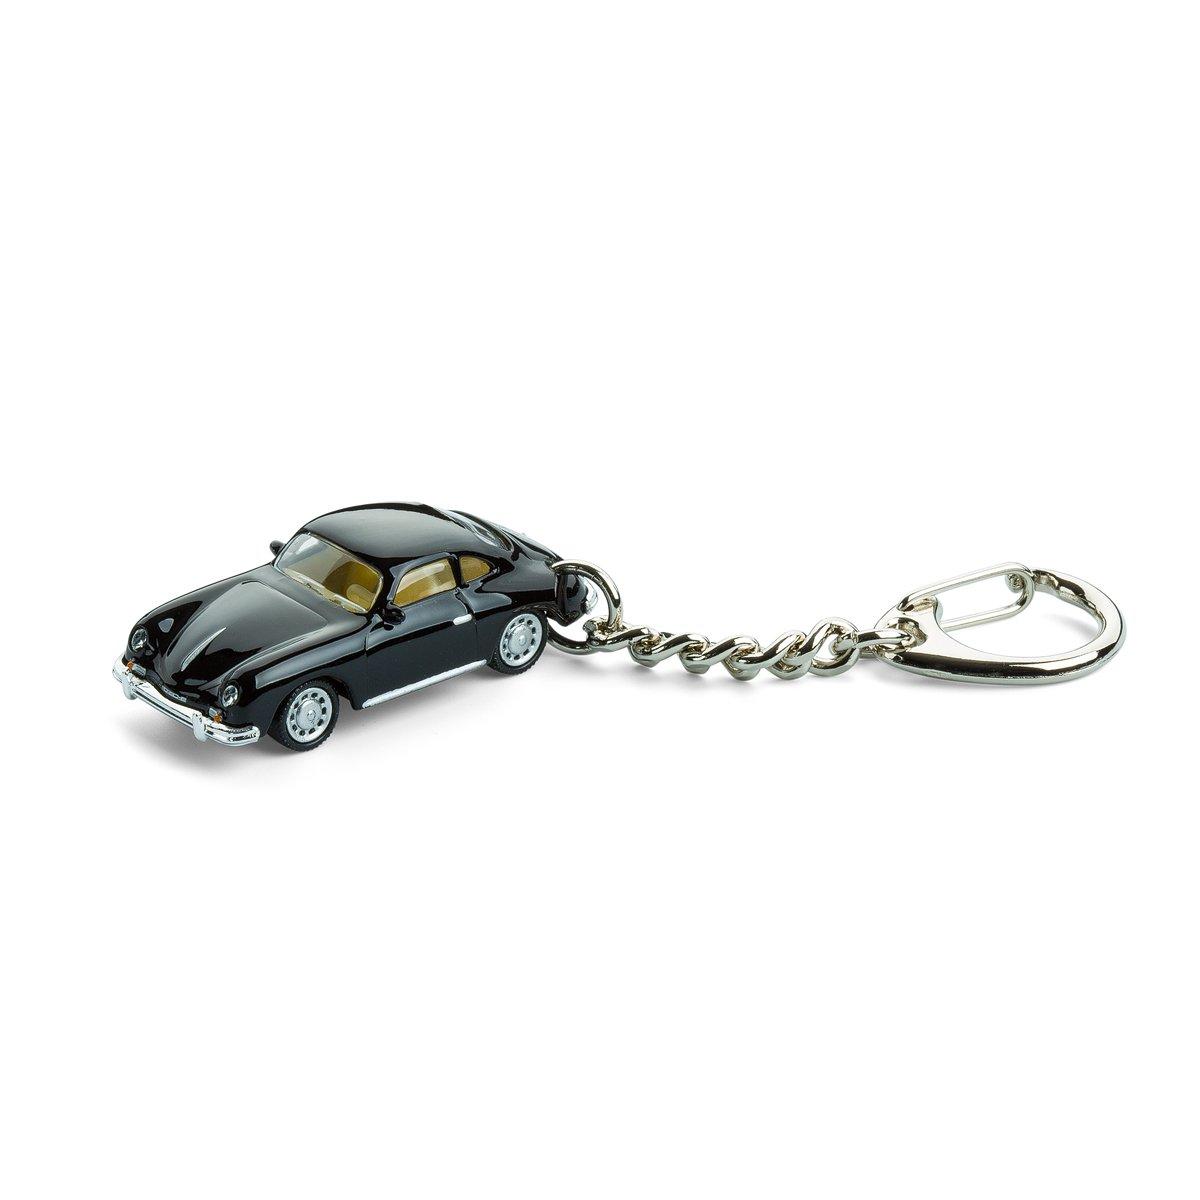 Llavero con coche en miniatura, Fiat 500 Sport, 1:87 corpus delicti